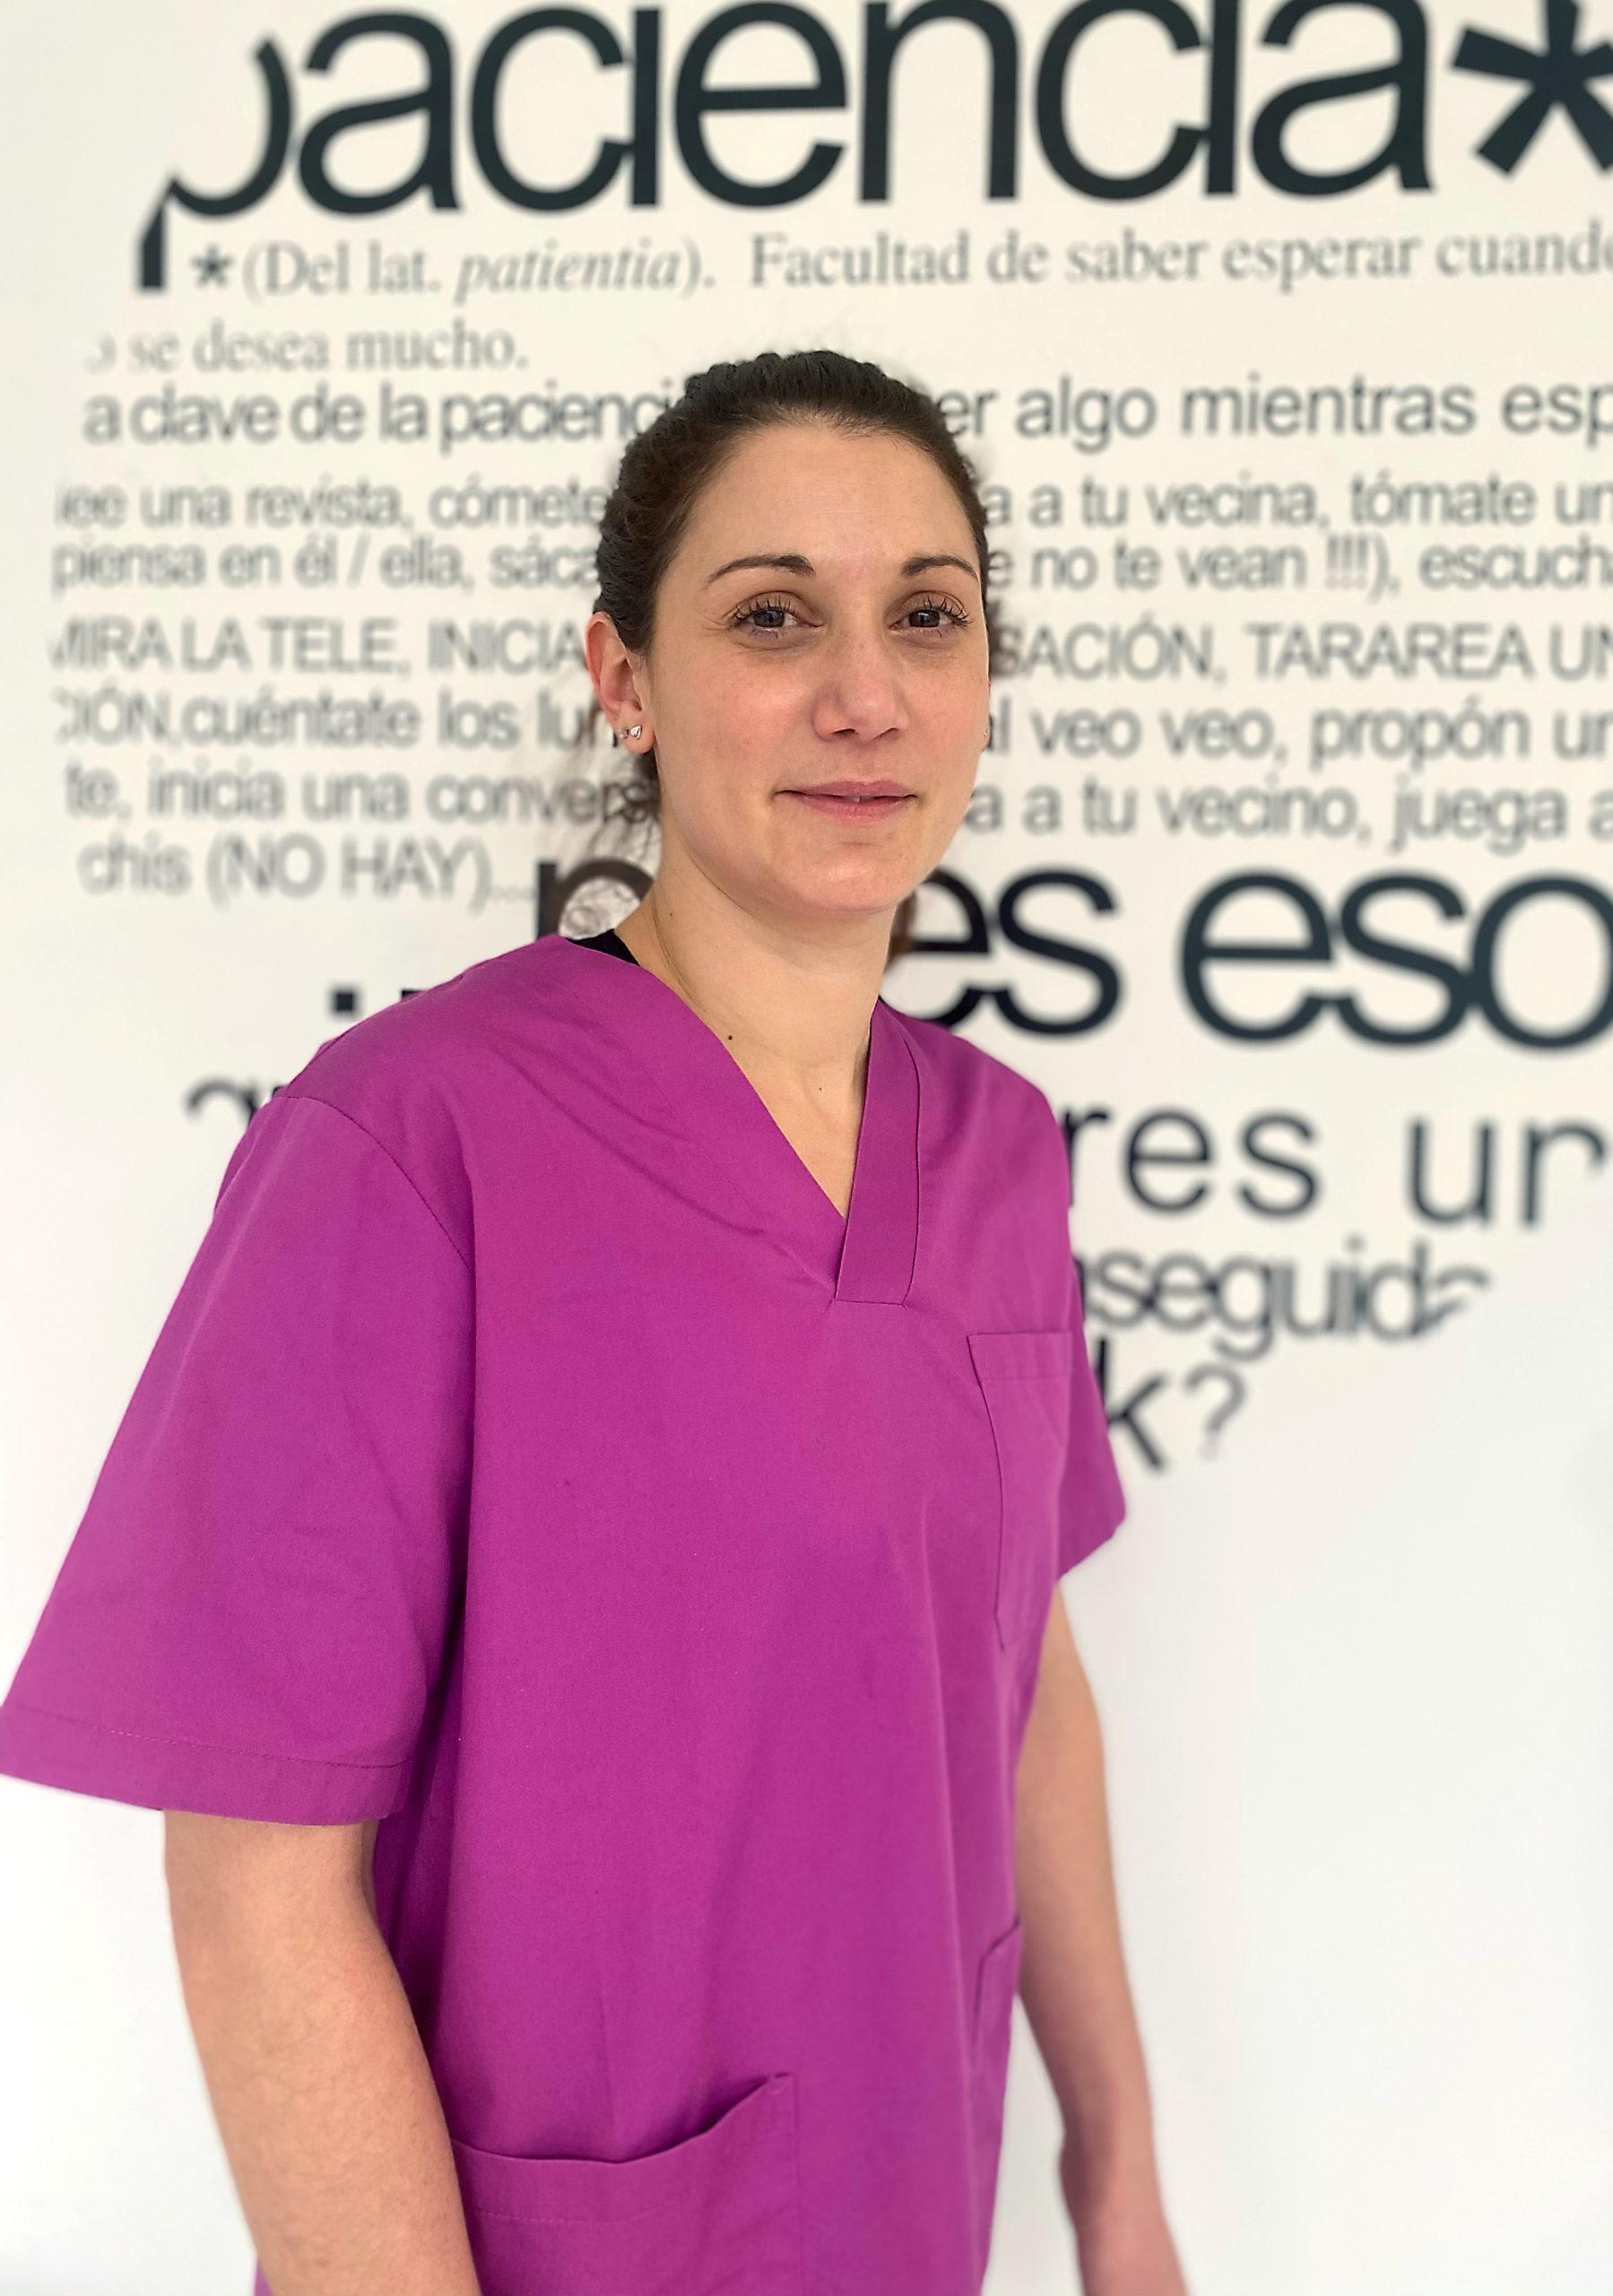 Dña. Natalia Barbero Díaz